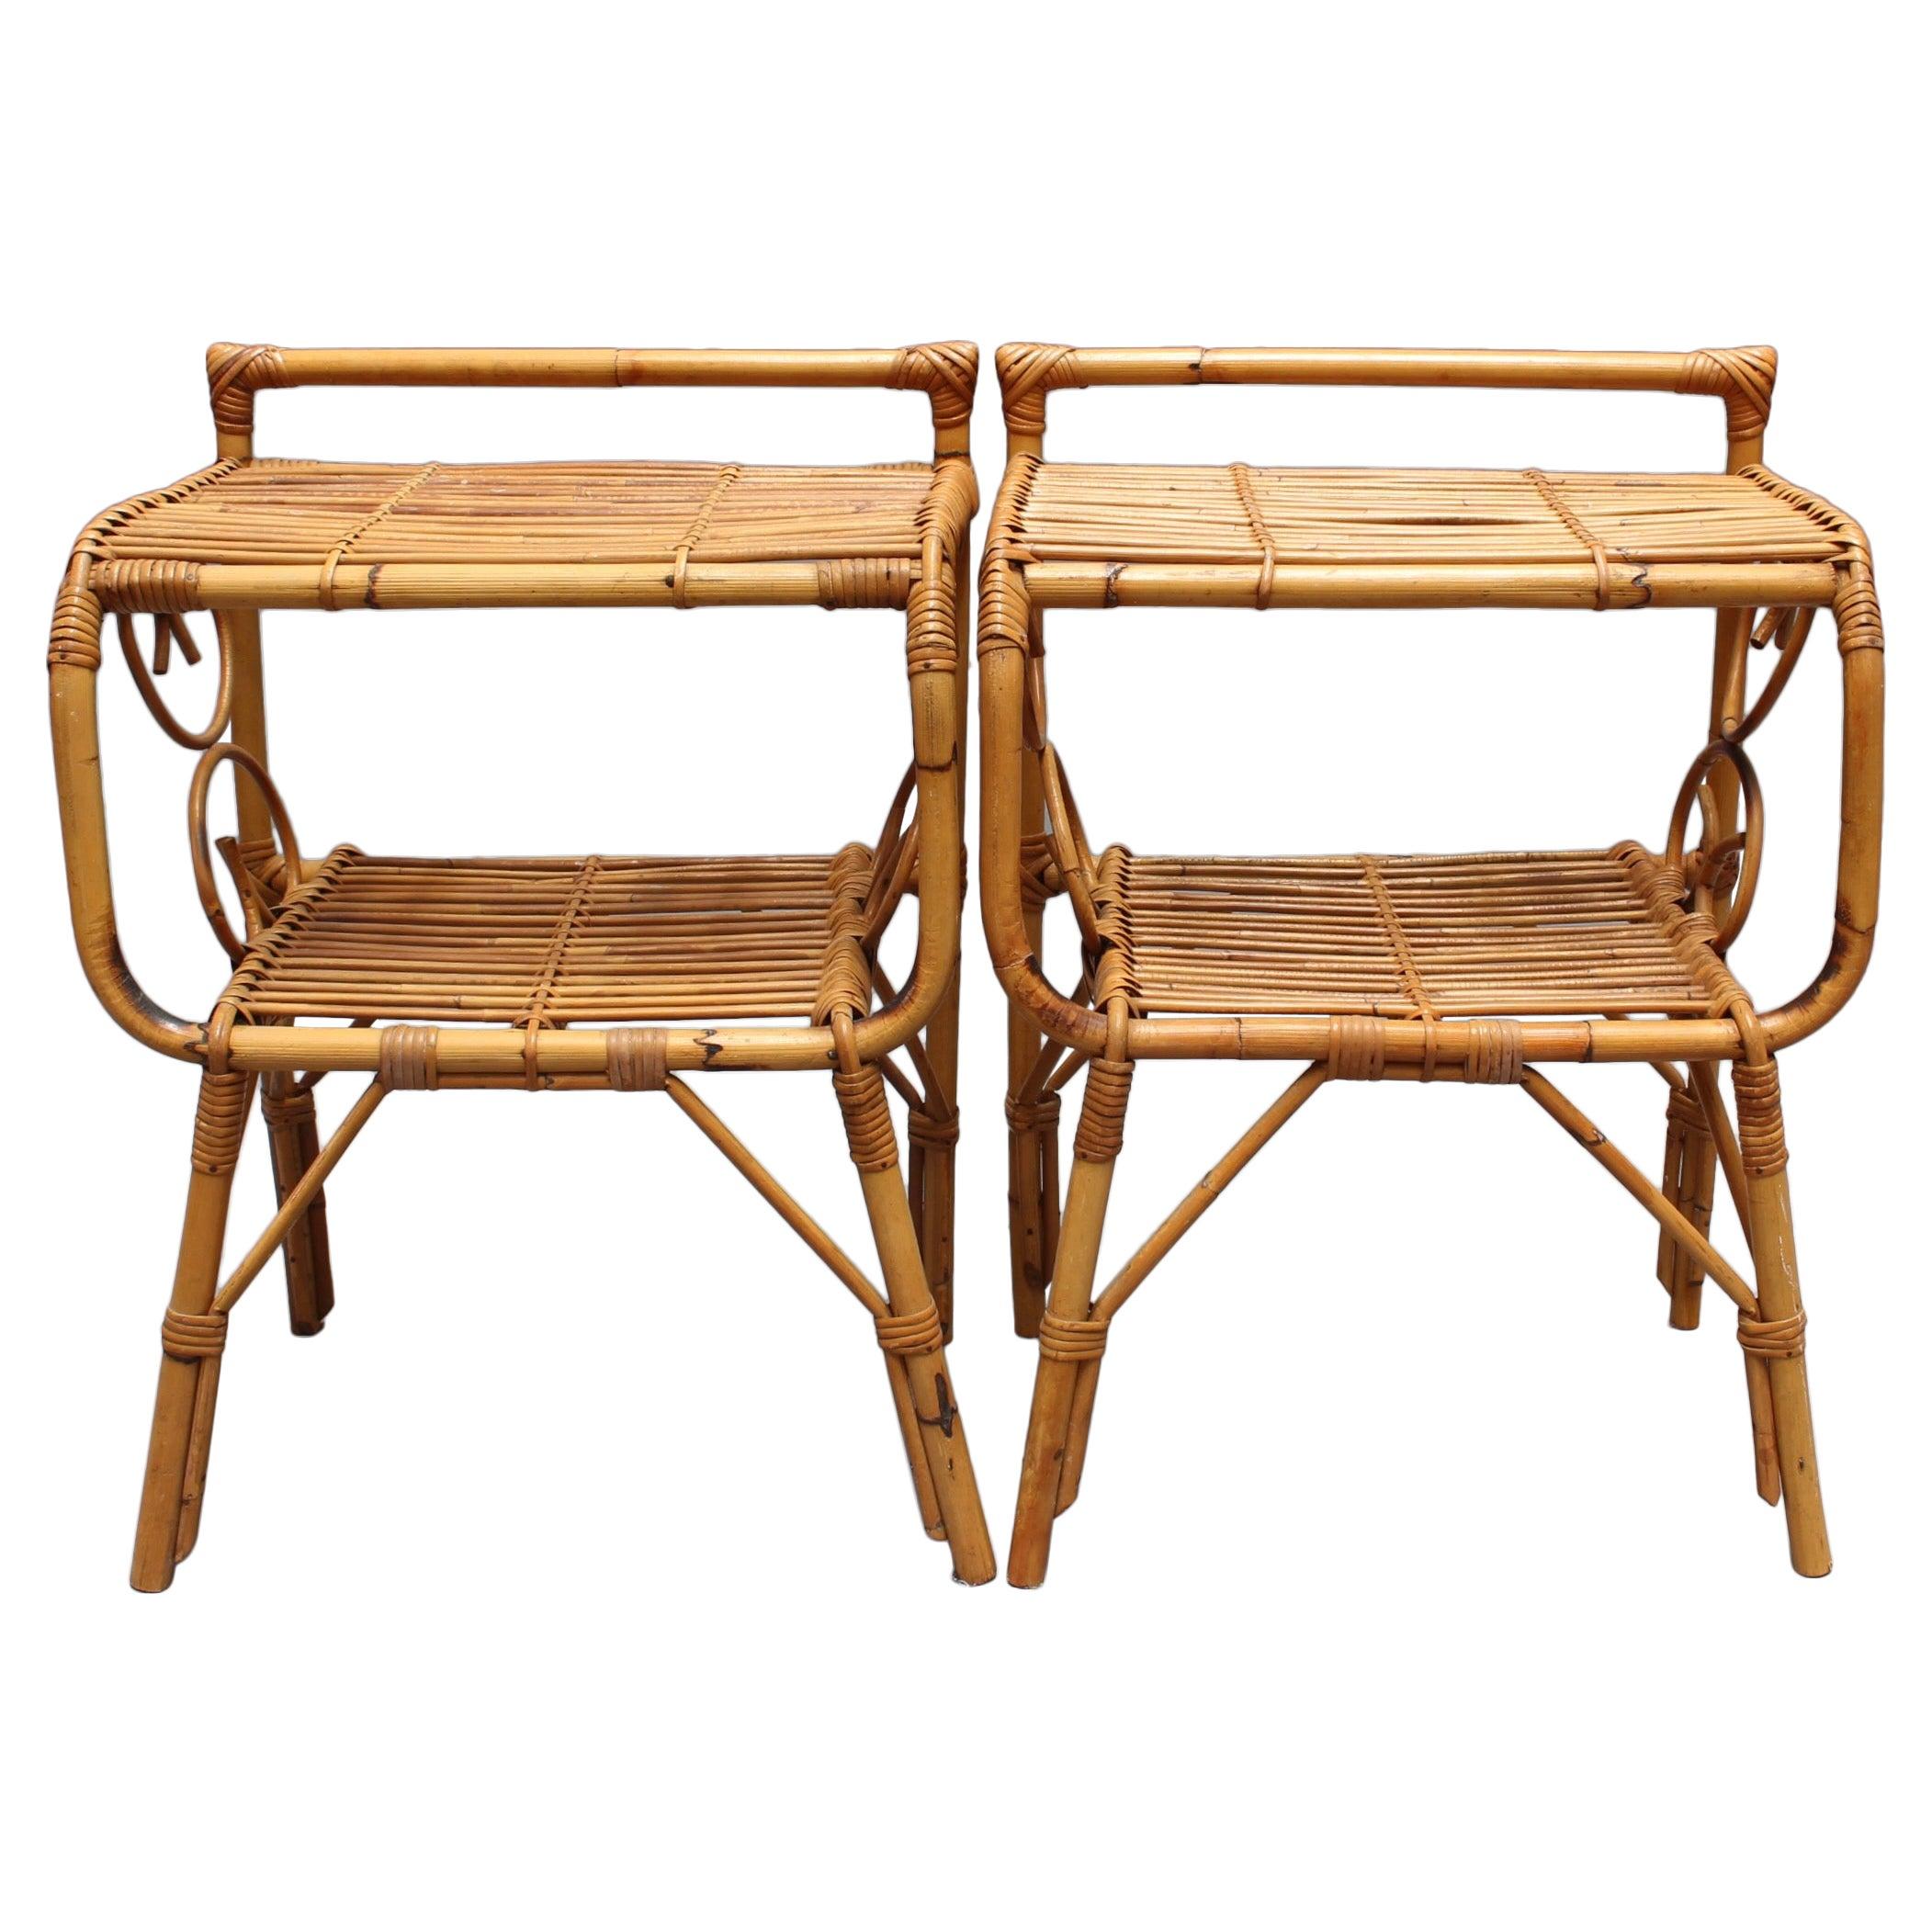 Pair of Italian Rattan Bedside Tables 'circa 1960s'